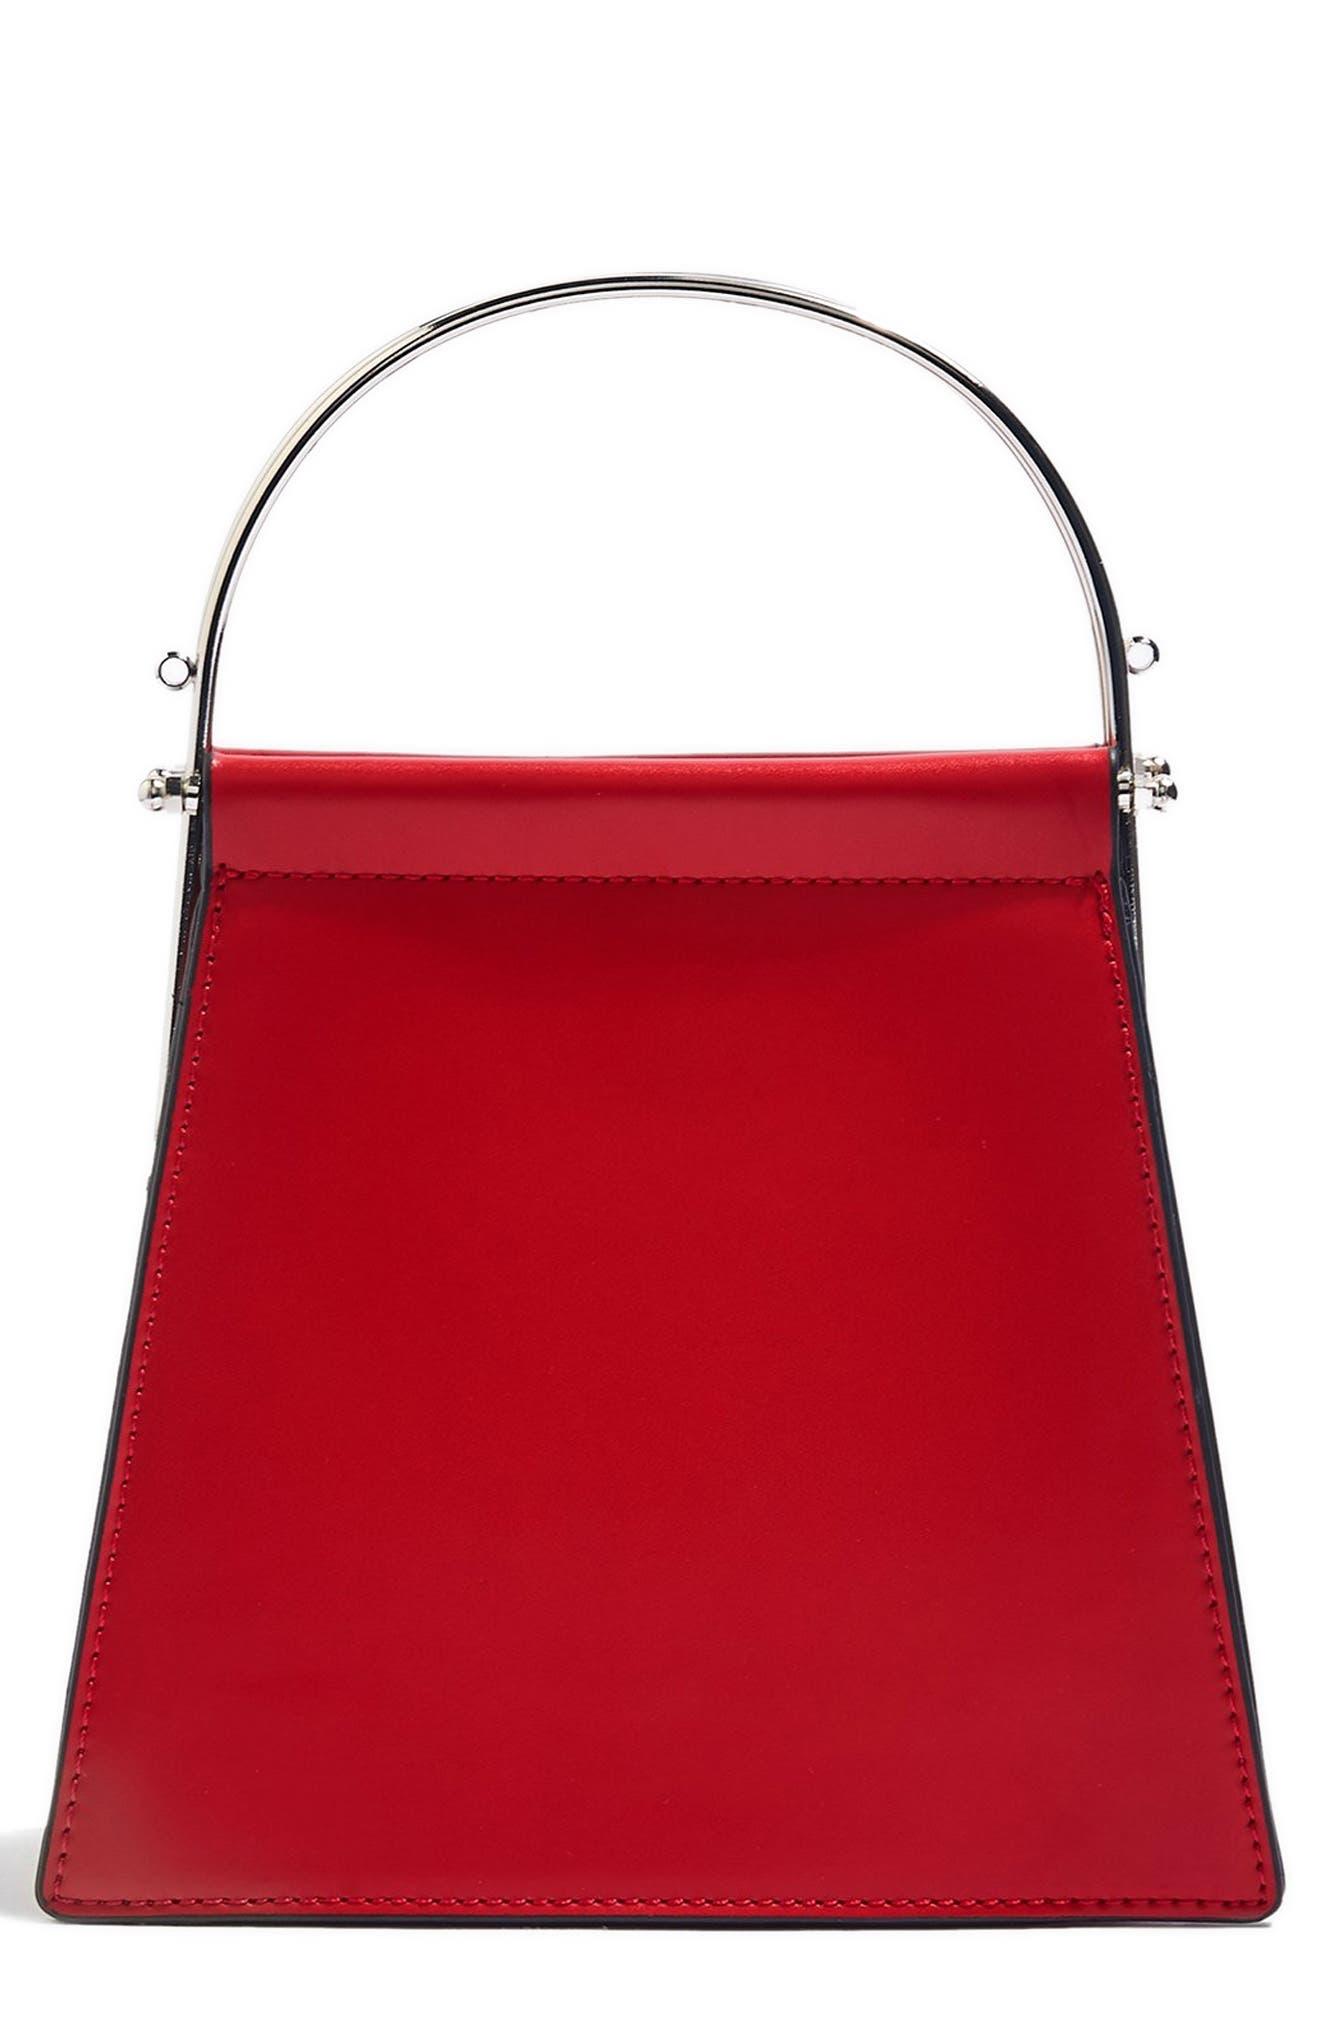 e21c18fcea Topshop Handbags   Wallets for Women